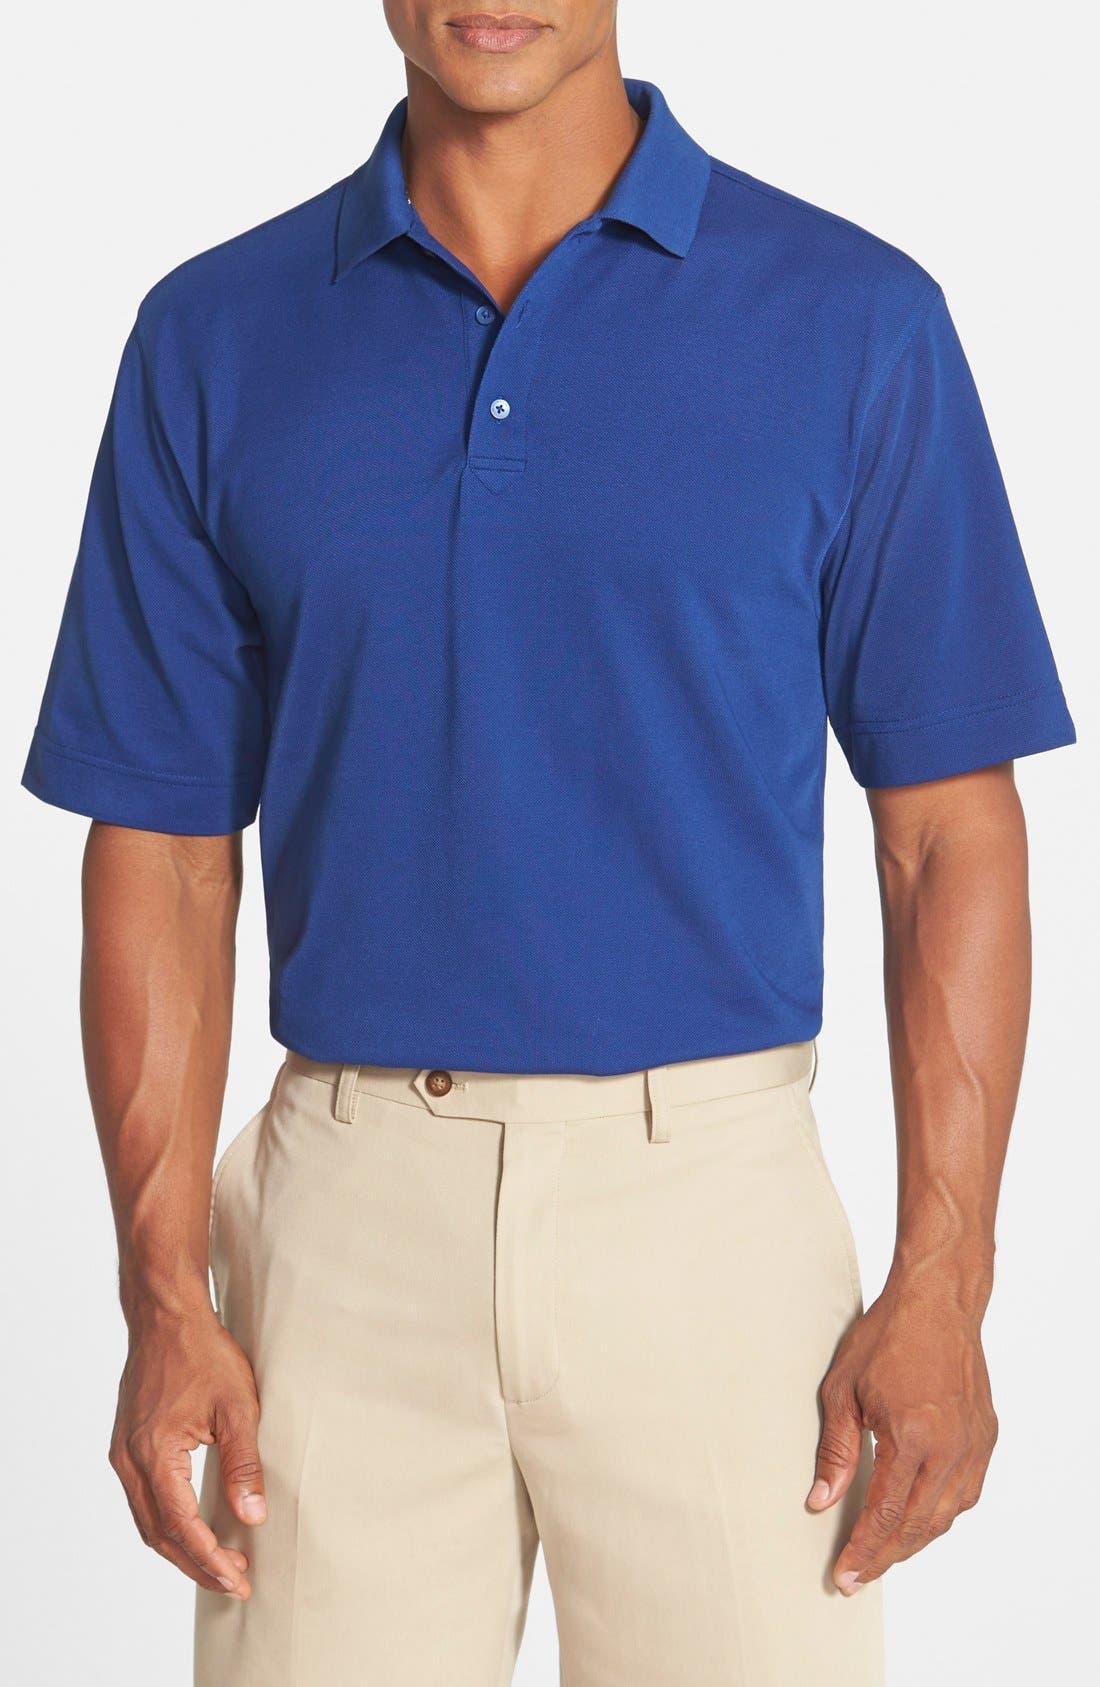 'Championship' Classic Fit DryTec Golf Polo,                             Main thumbnail 1, color,                             TOUR BLUE